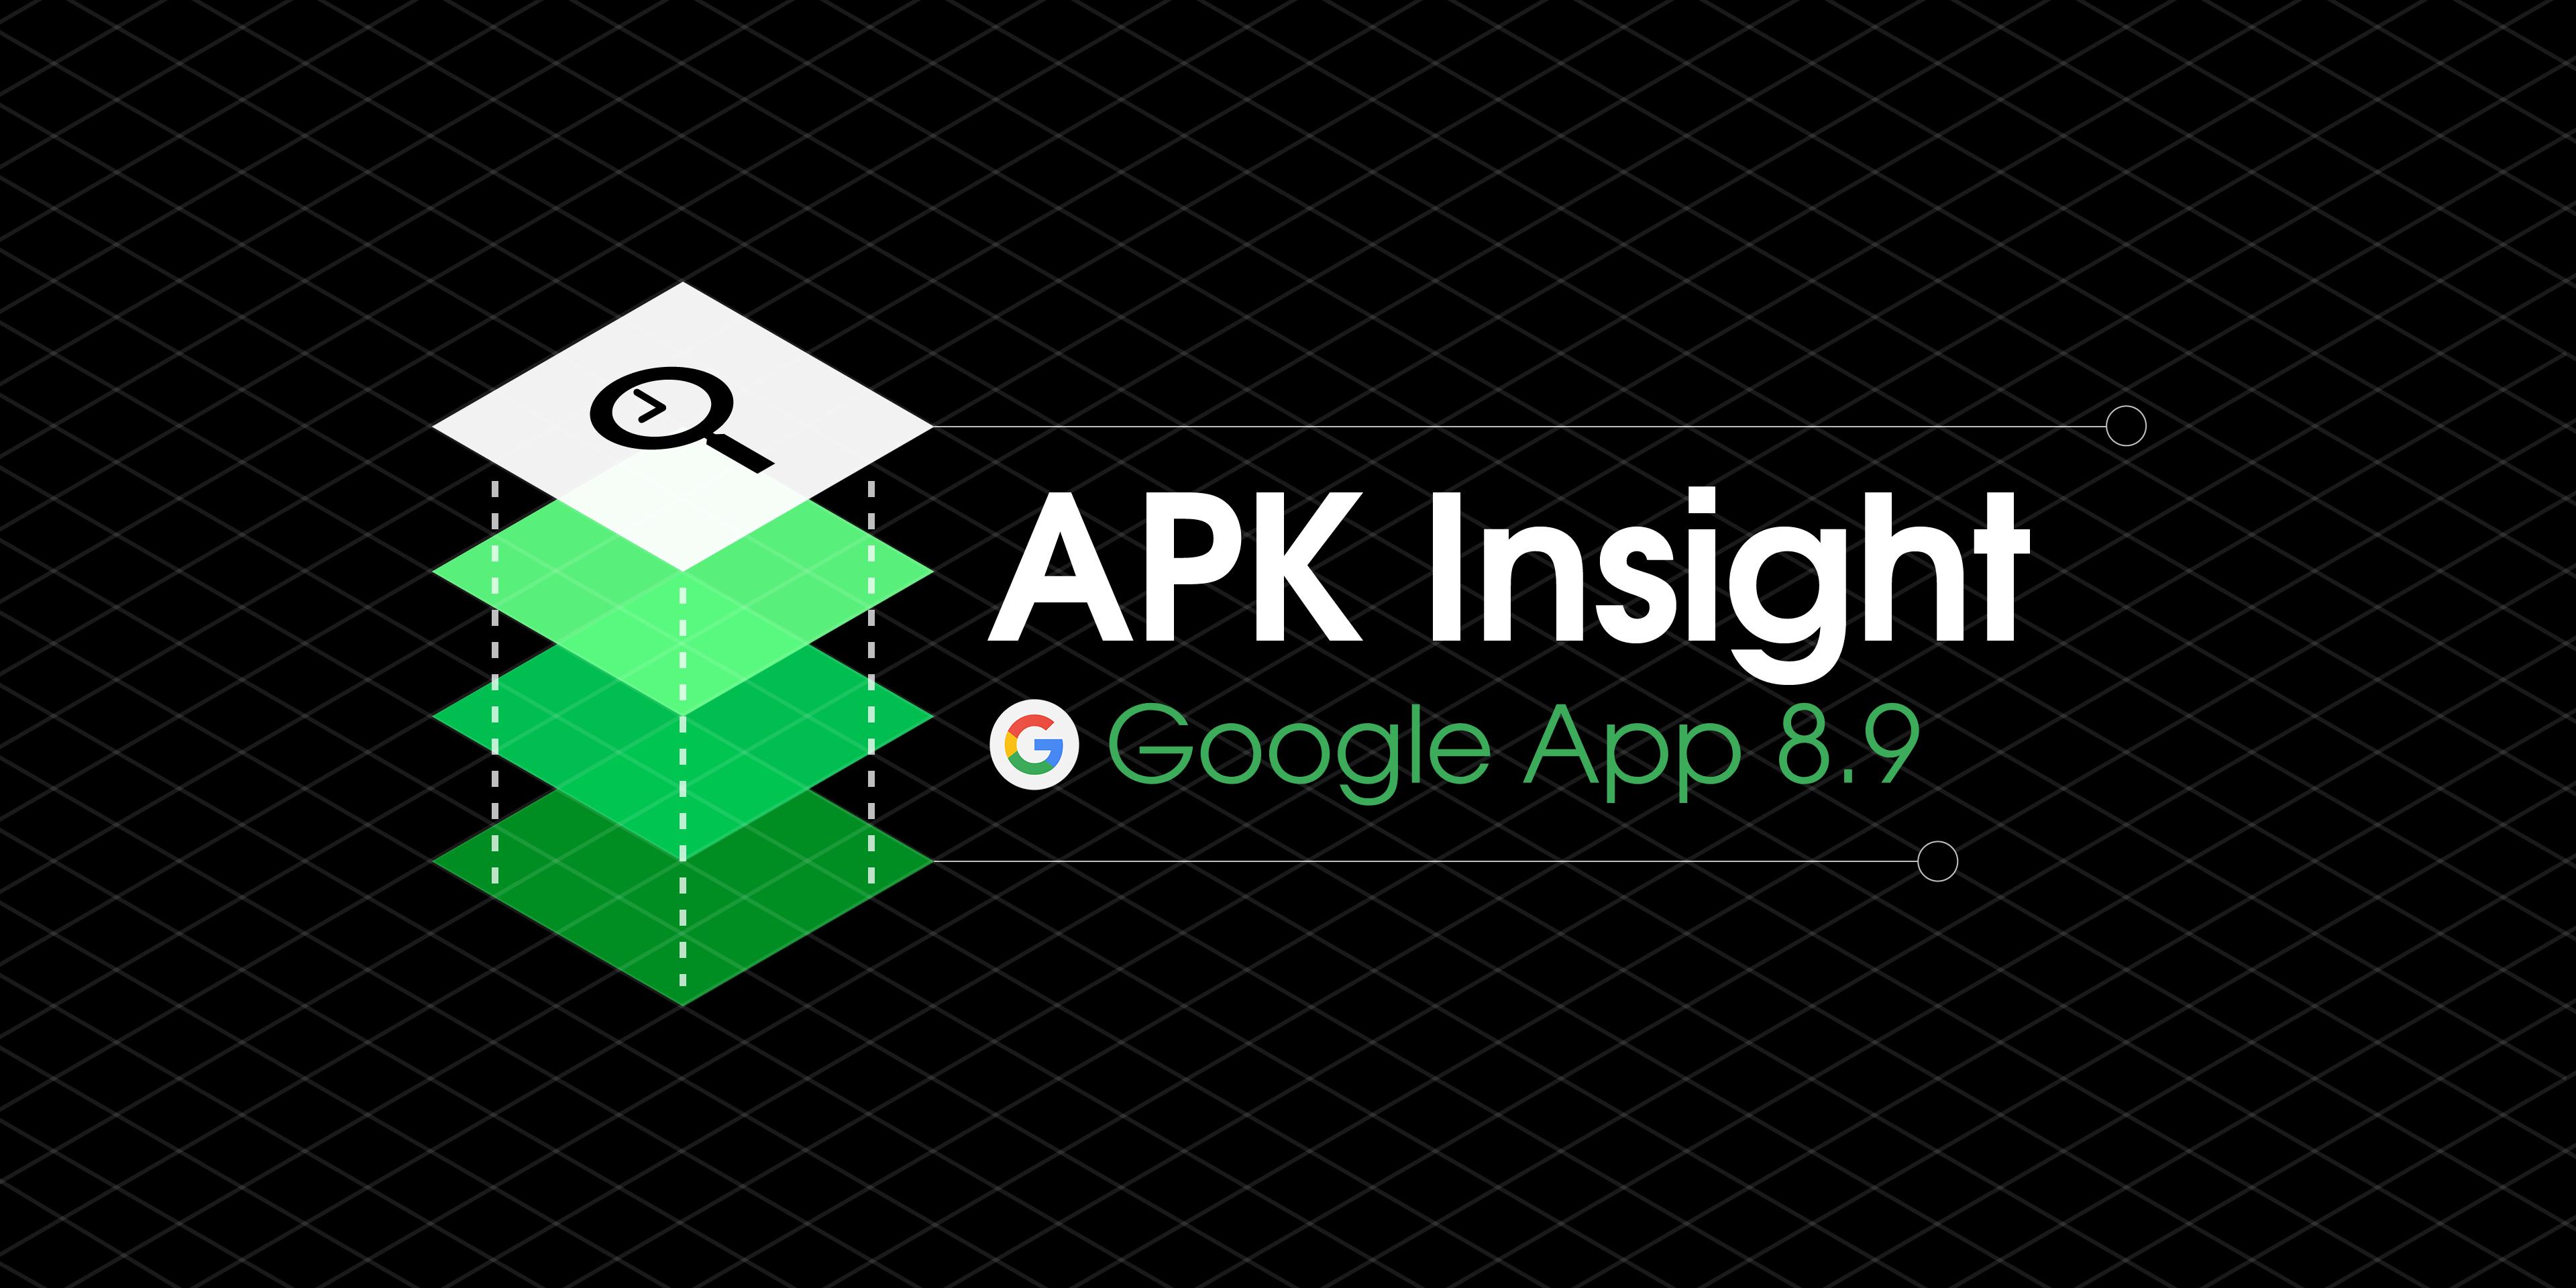 Google app 8 9 preps Cast support in Podcasts, sending Assistant